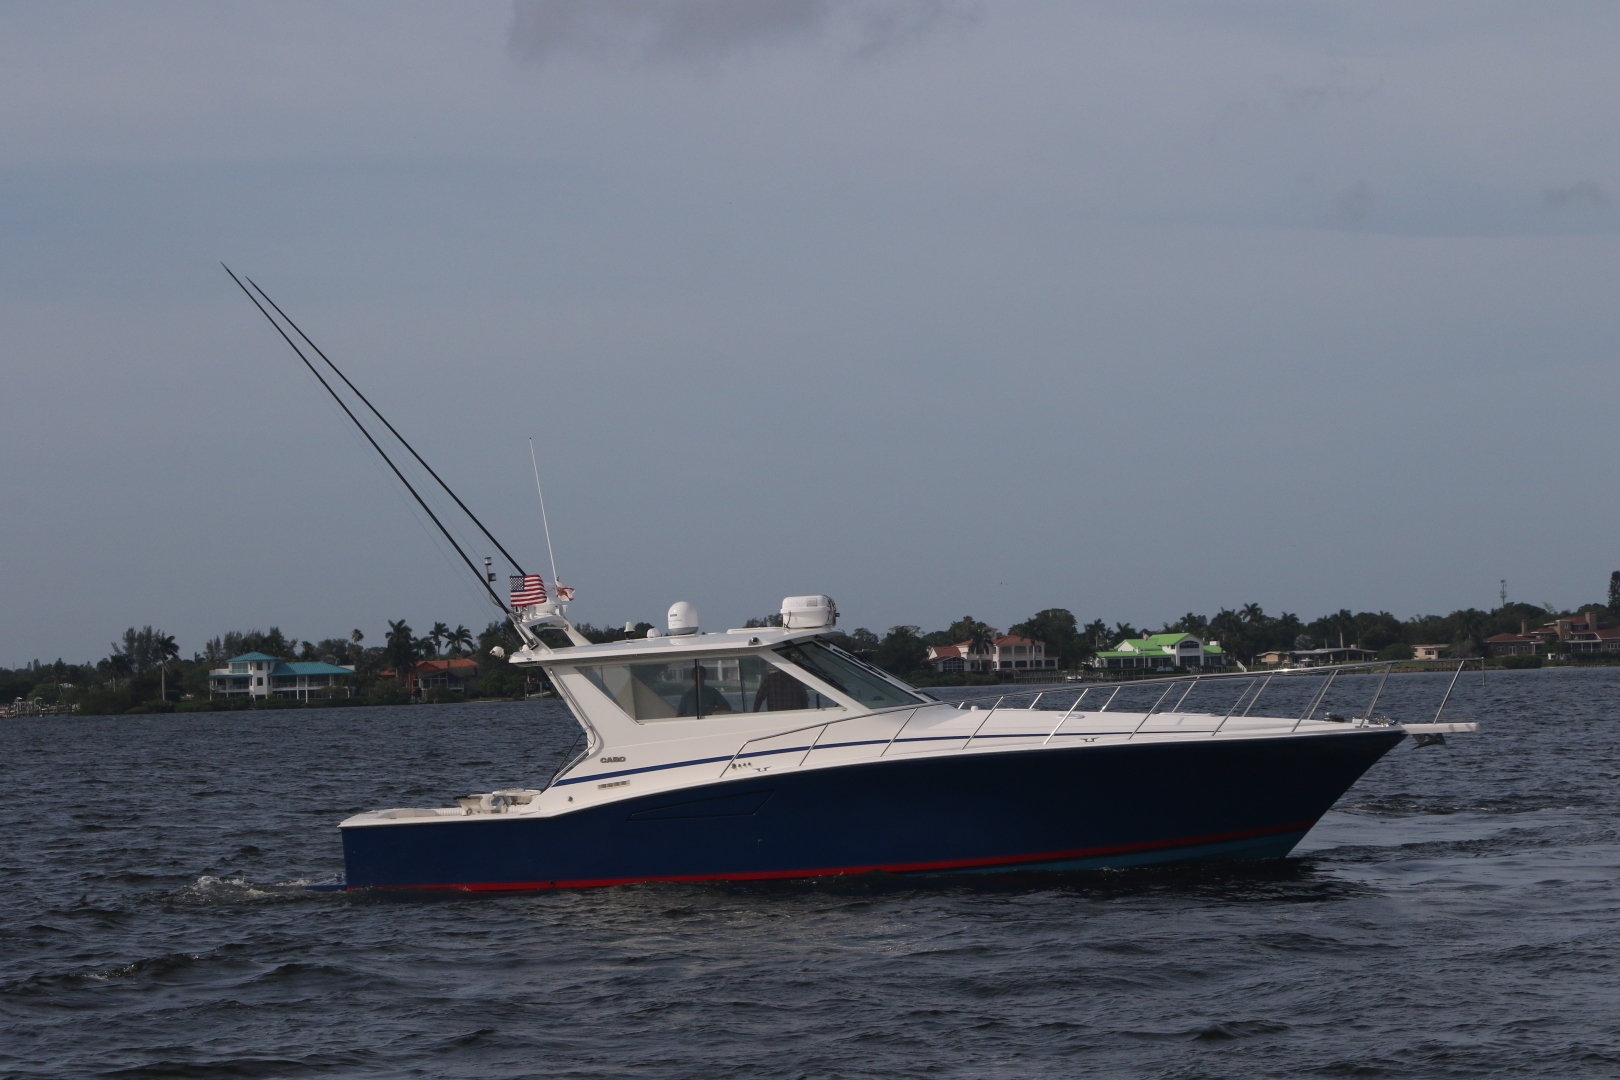 Cabo-45 Express 1997-Reel Life Panama City Beach-Florida-United States-45 Cabo Express-1369525   Thumbnail